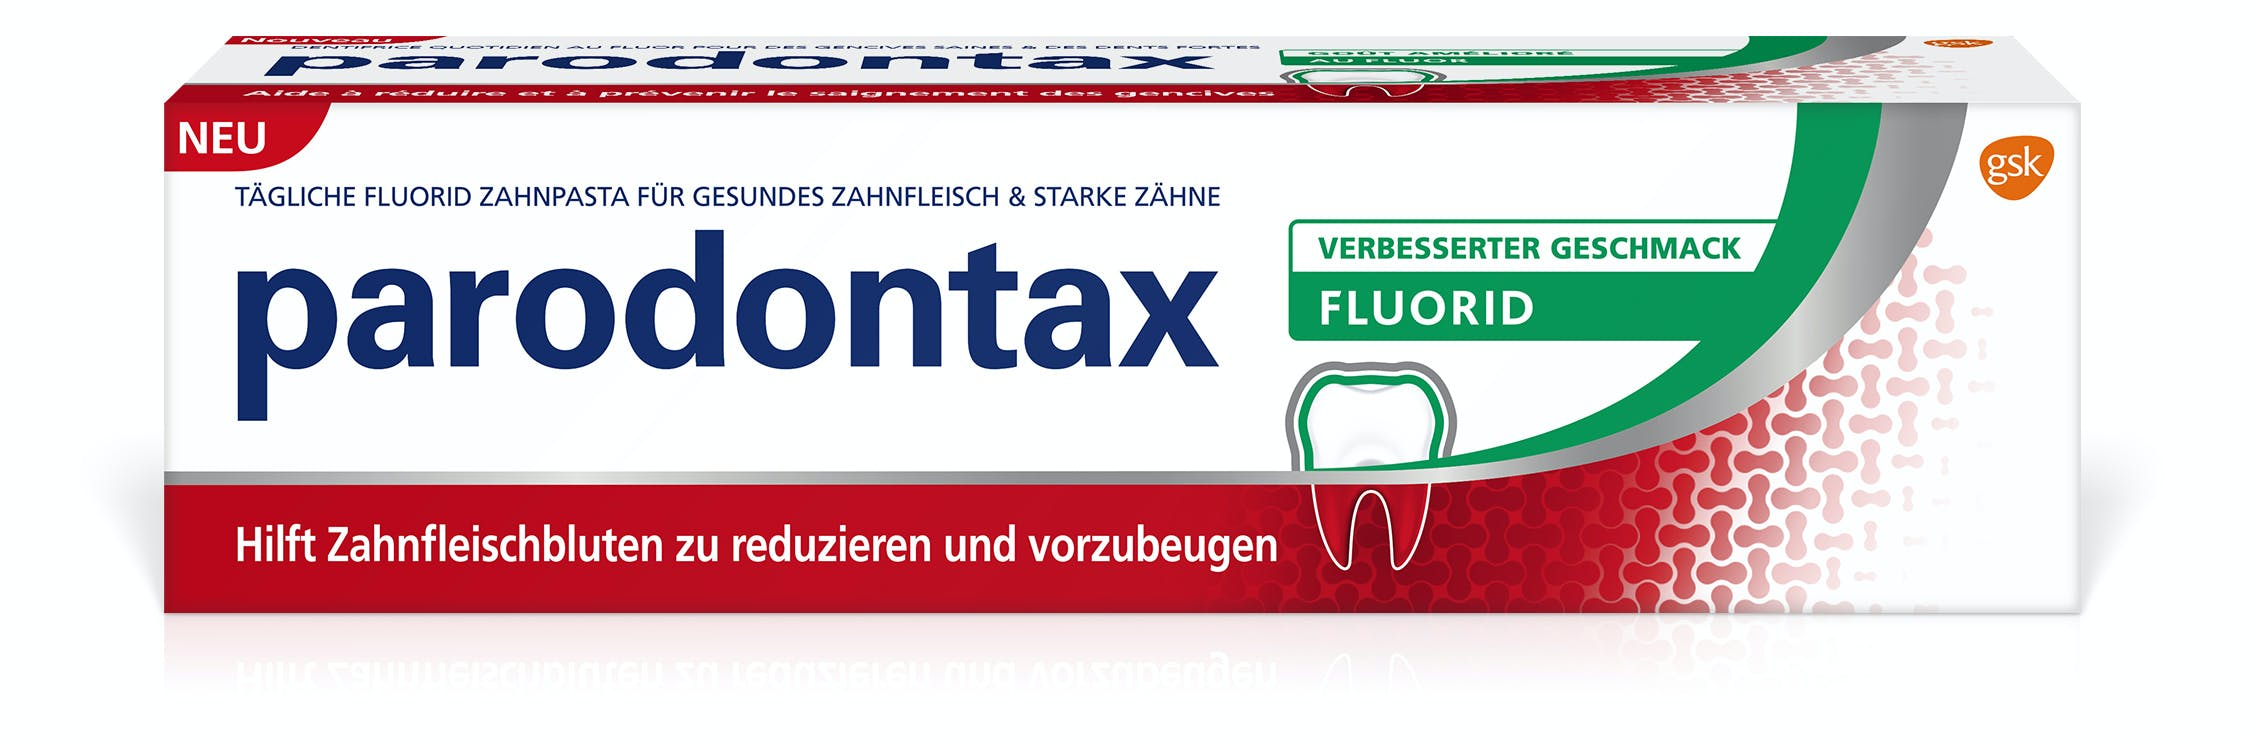 parodontax tägliche Fluorid Zahnpasta